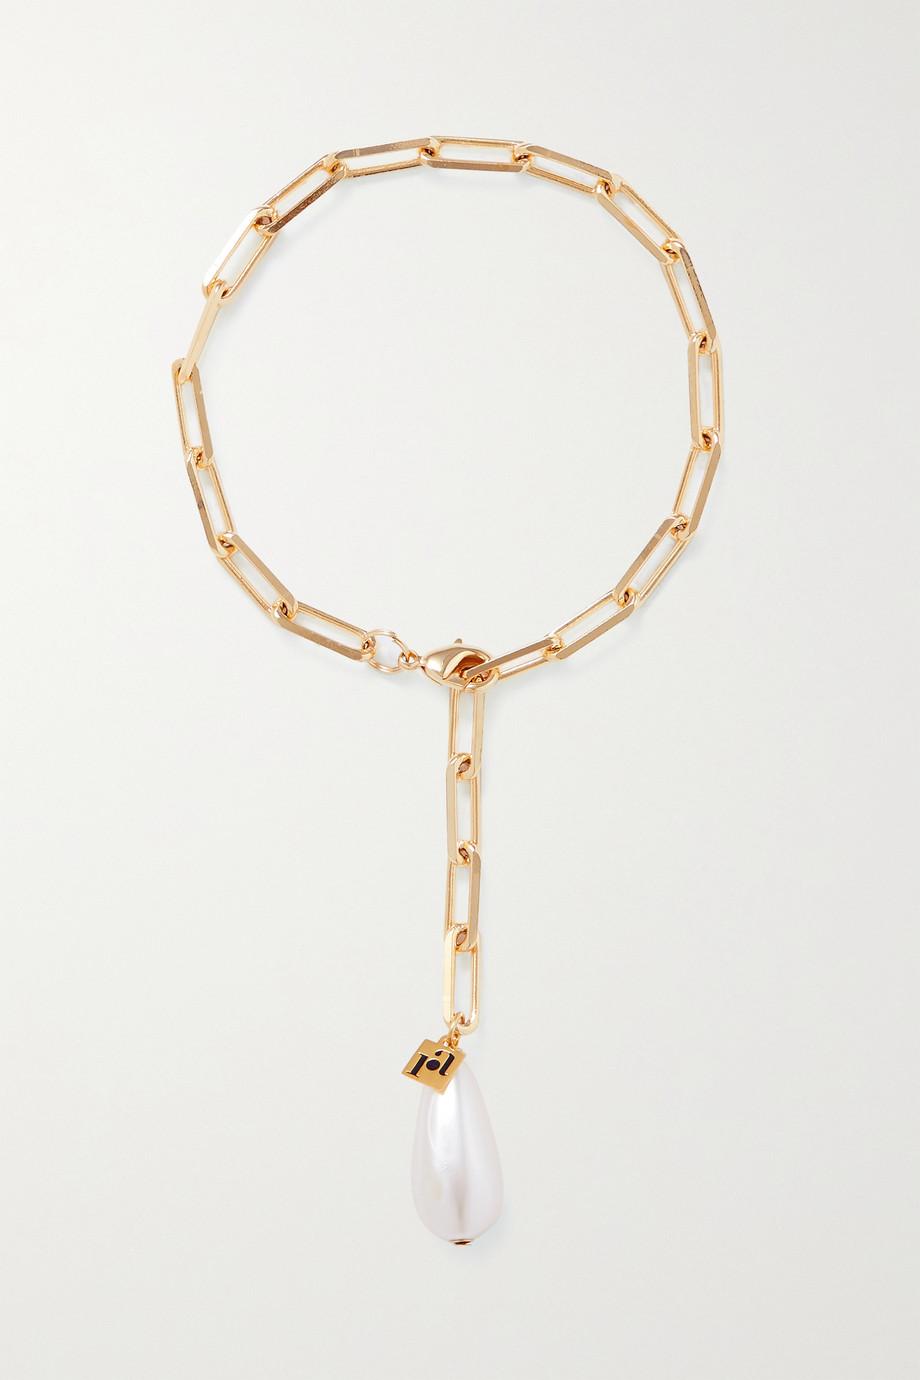 Rosantica Promessa gold-tone faux pearl anklet